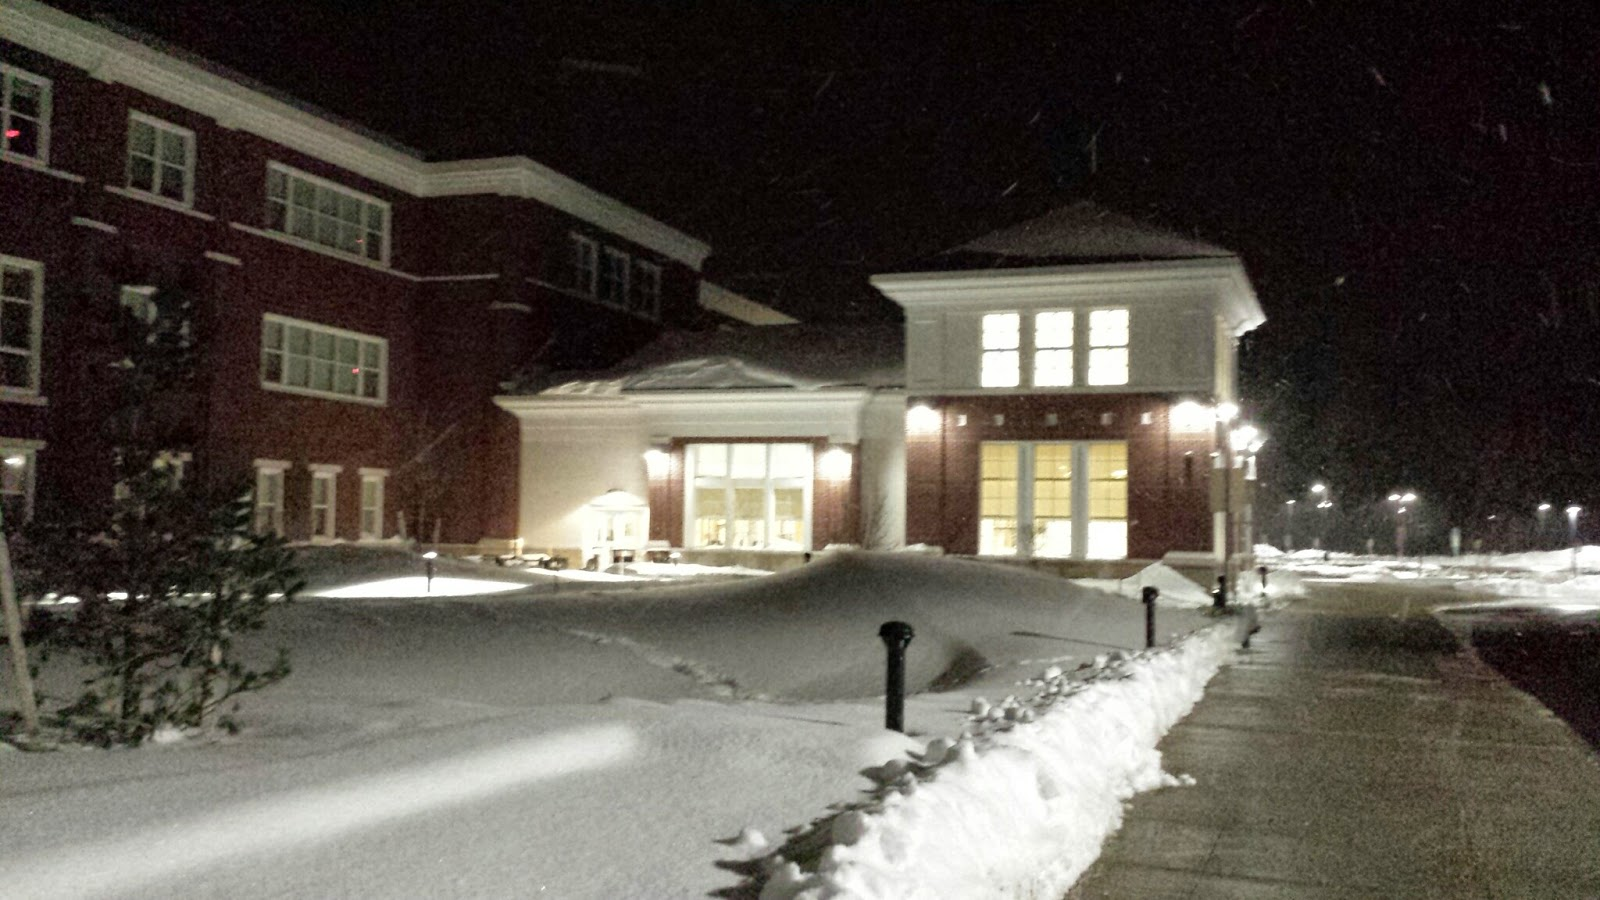 Franklin High School on a winter's night